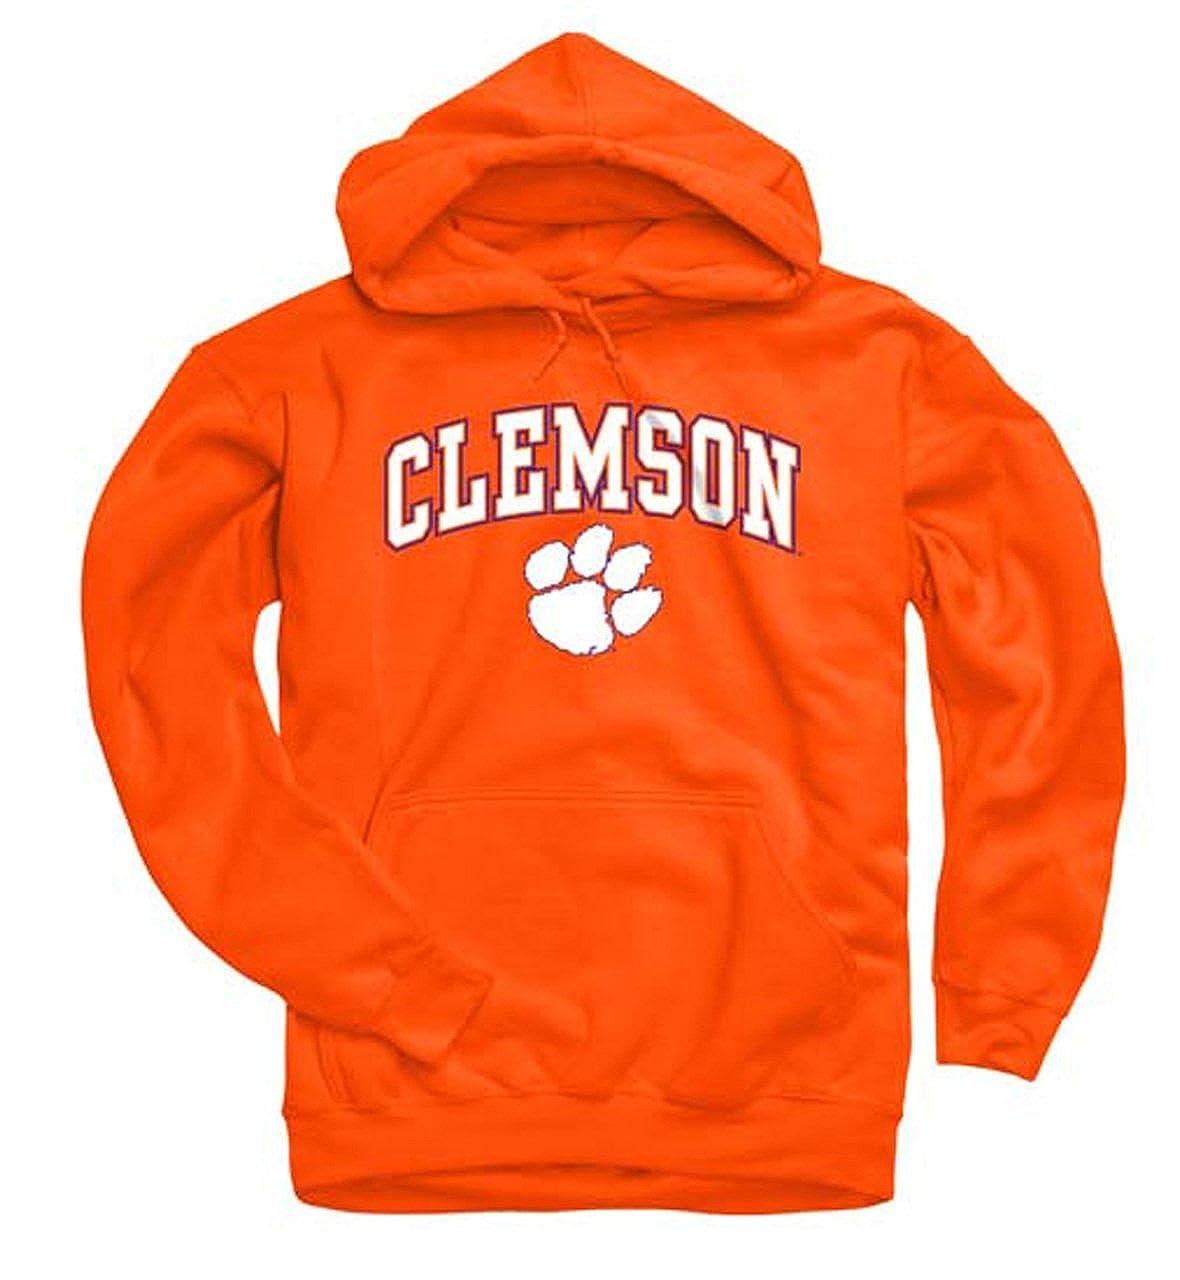 Campus Colors Clemson Tigers Arch Logo Gameday Hooded Sweatshirt Orange